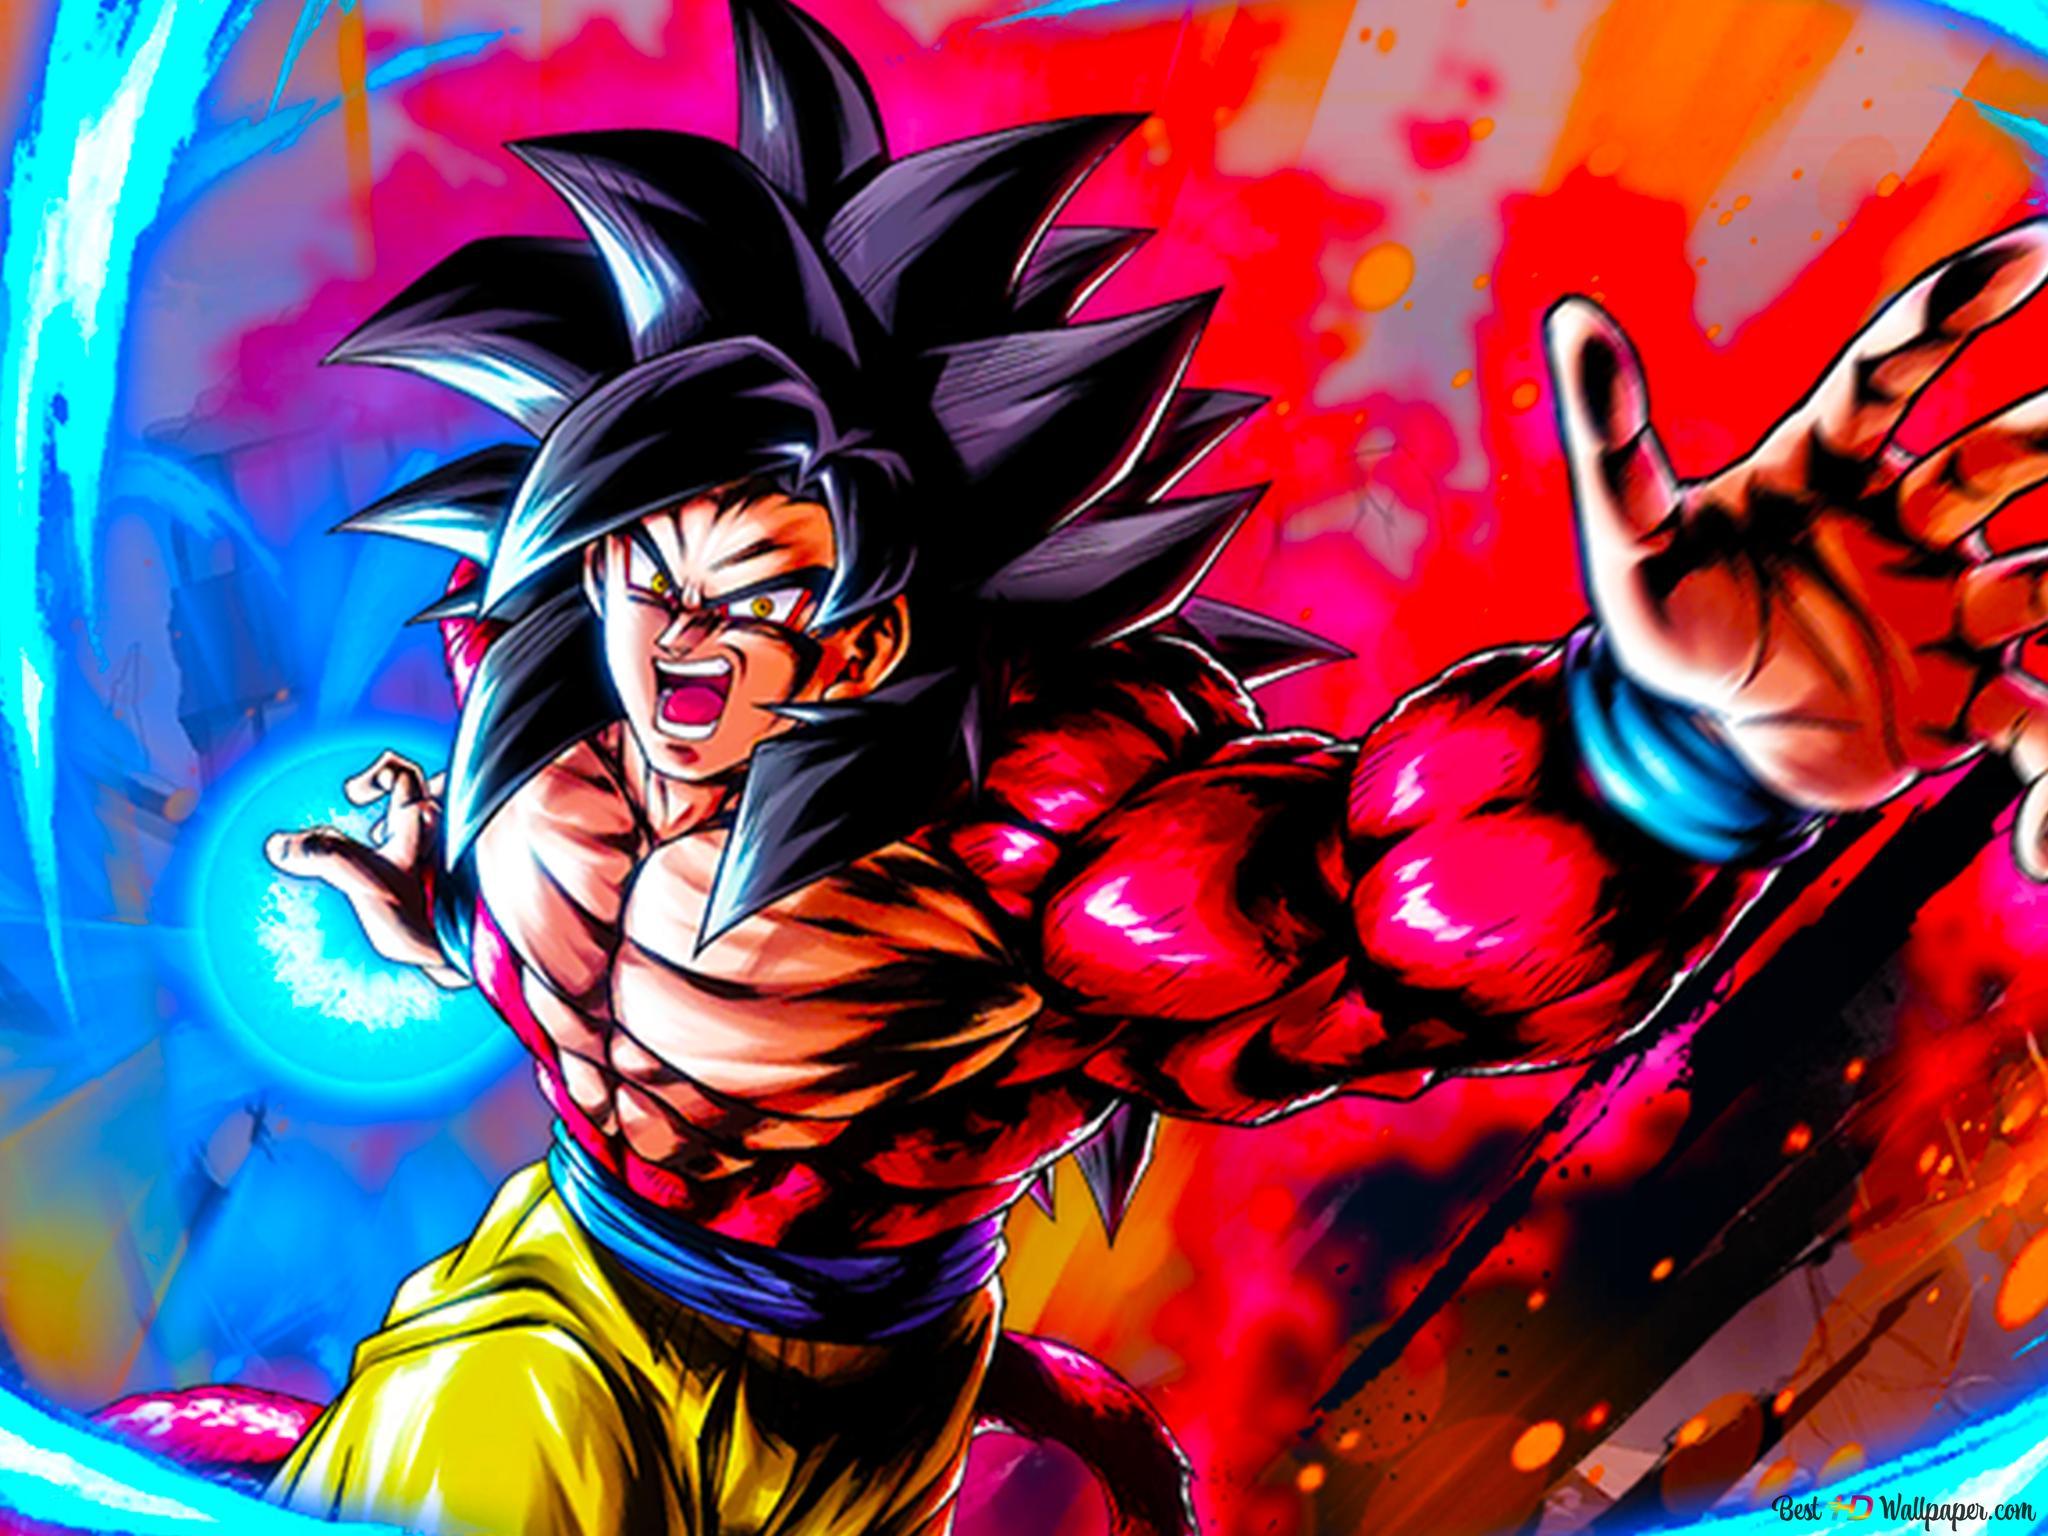 Super Saiyan 4 Goku Dragon Ball Gt Art From Dragon Ball Legends Android Iphone Hd Wallpaper Download